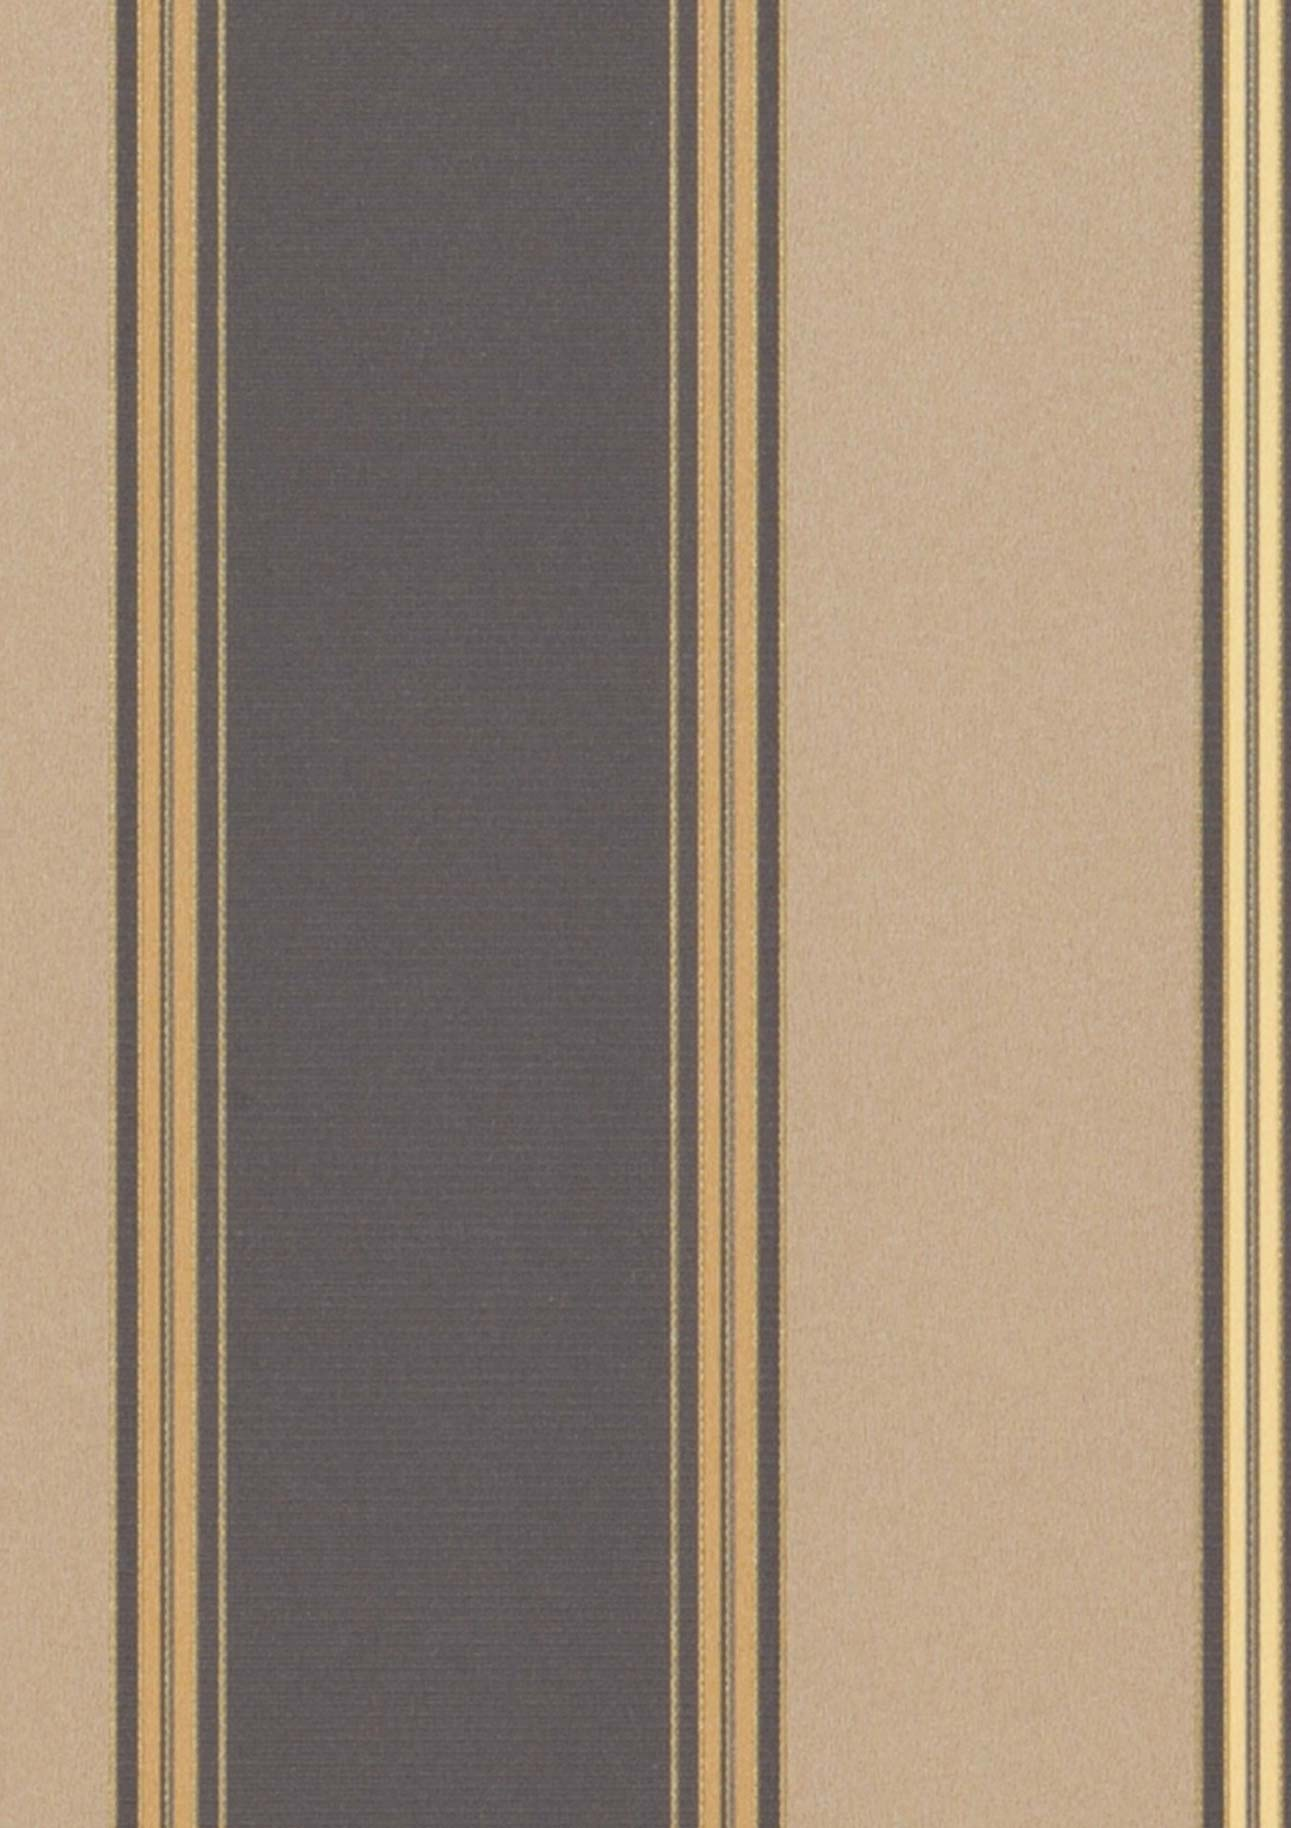 Tatex beige grigiastro chiaro beige grigio scuro oro for Carta da parati beige